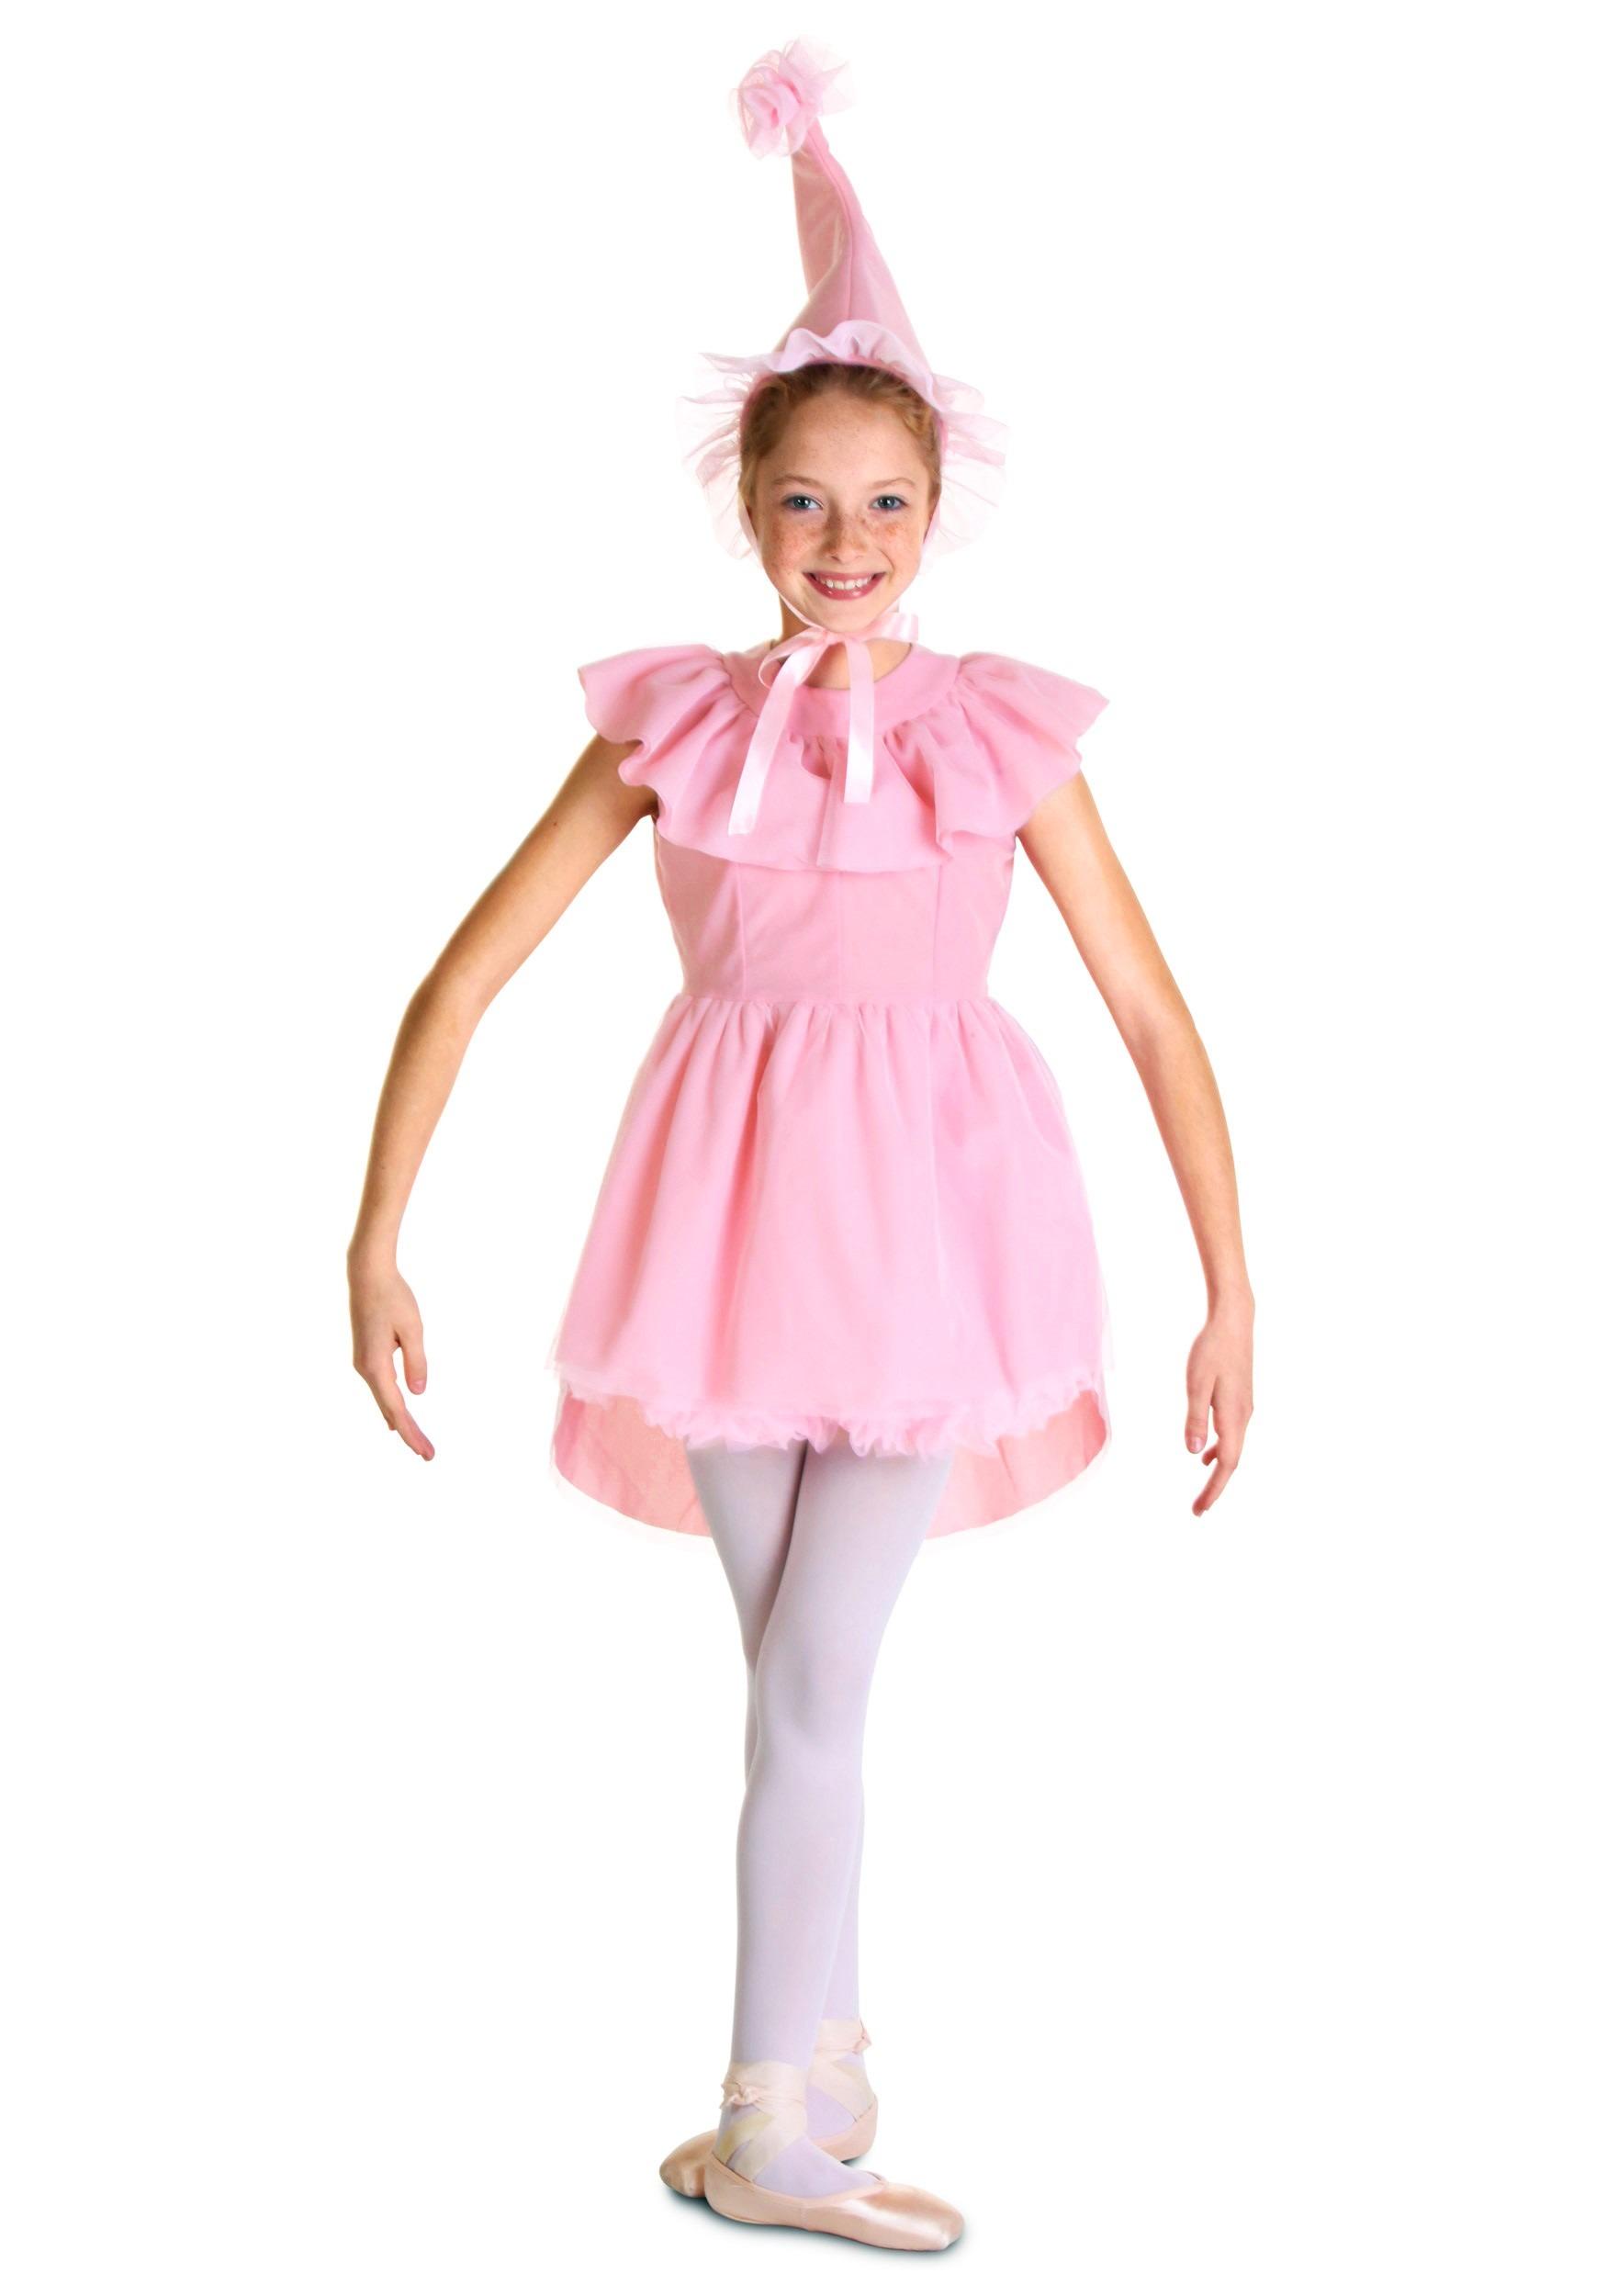 Child Munchkin Ballerina Costume  sc 1 st  Halloween Costumes & Wonderful Wizard of Oz Costumes - HalloweenCostumes.com